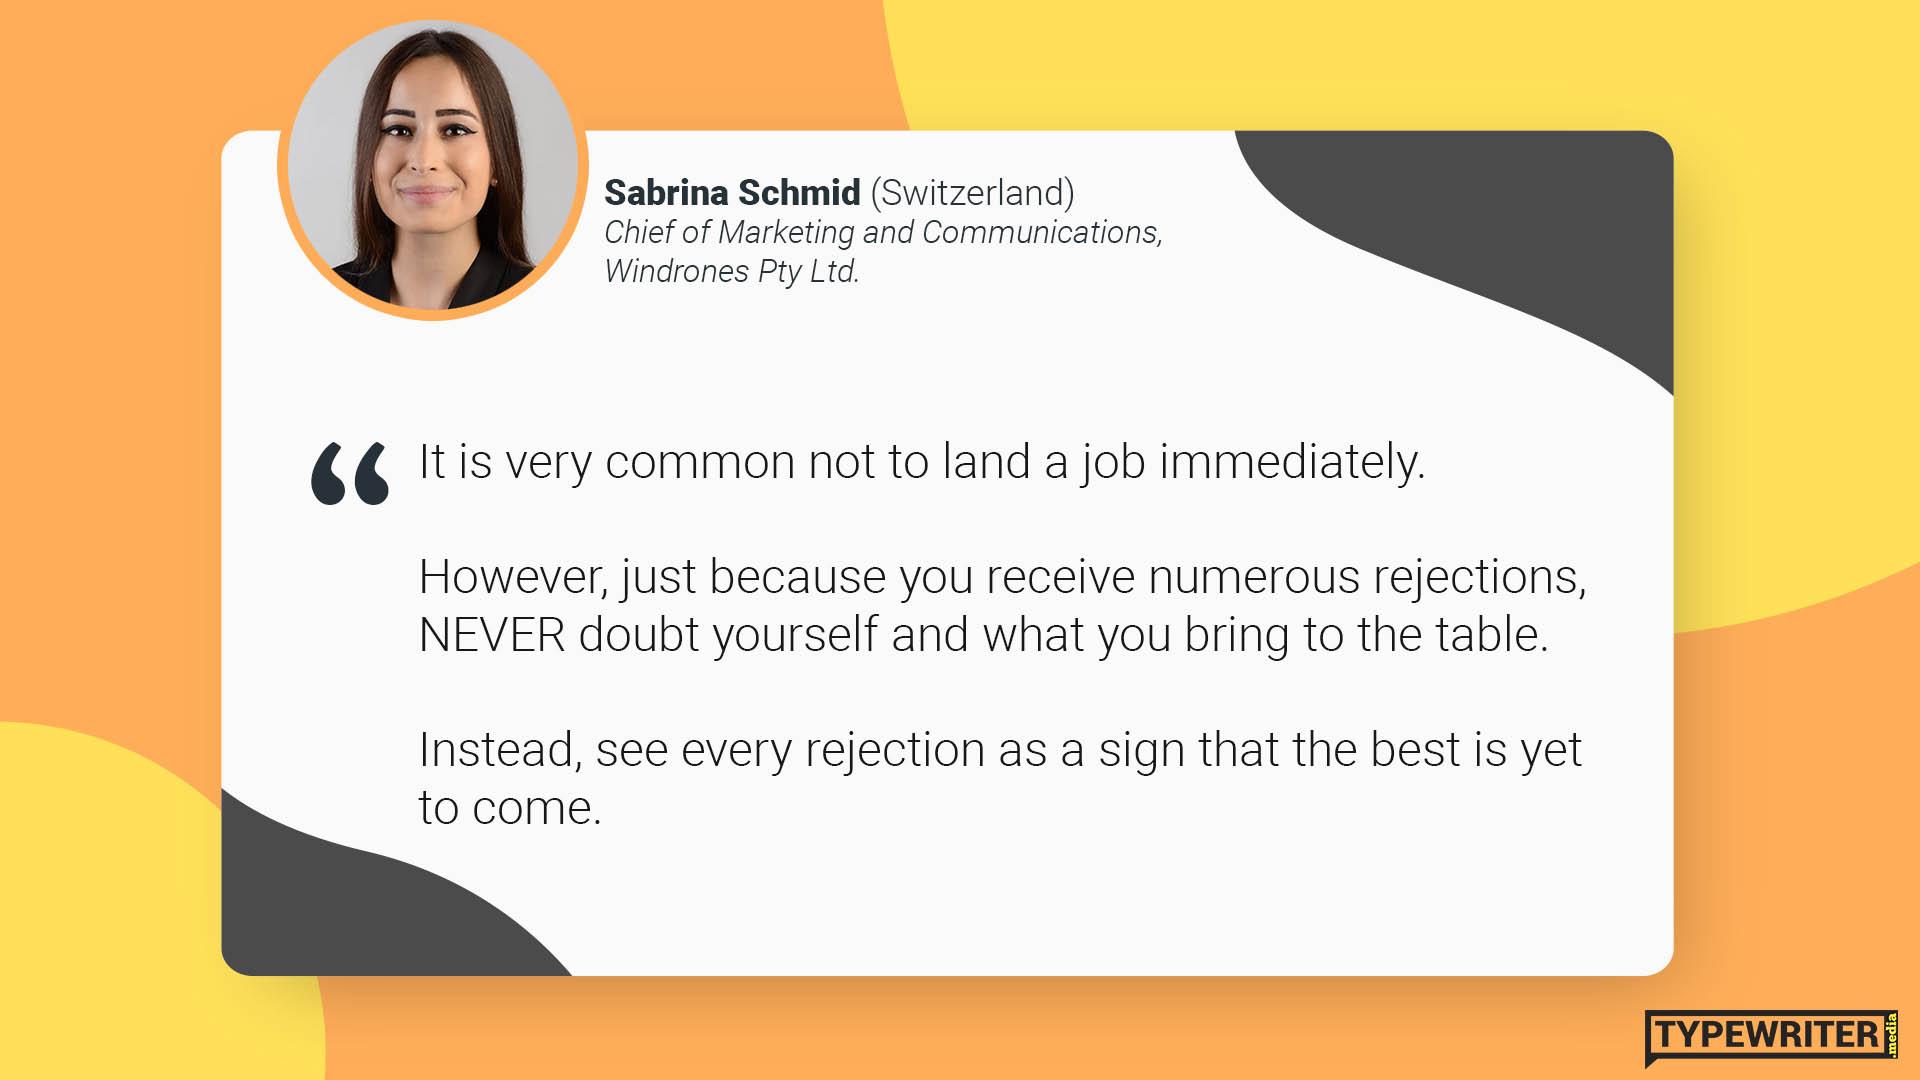 Sabrina advice to international communications graduates